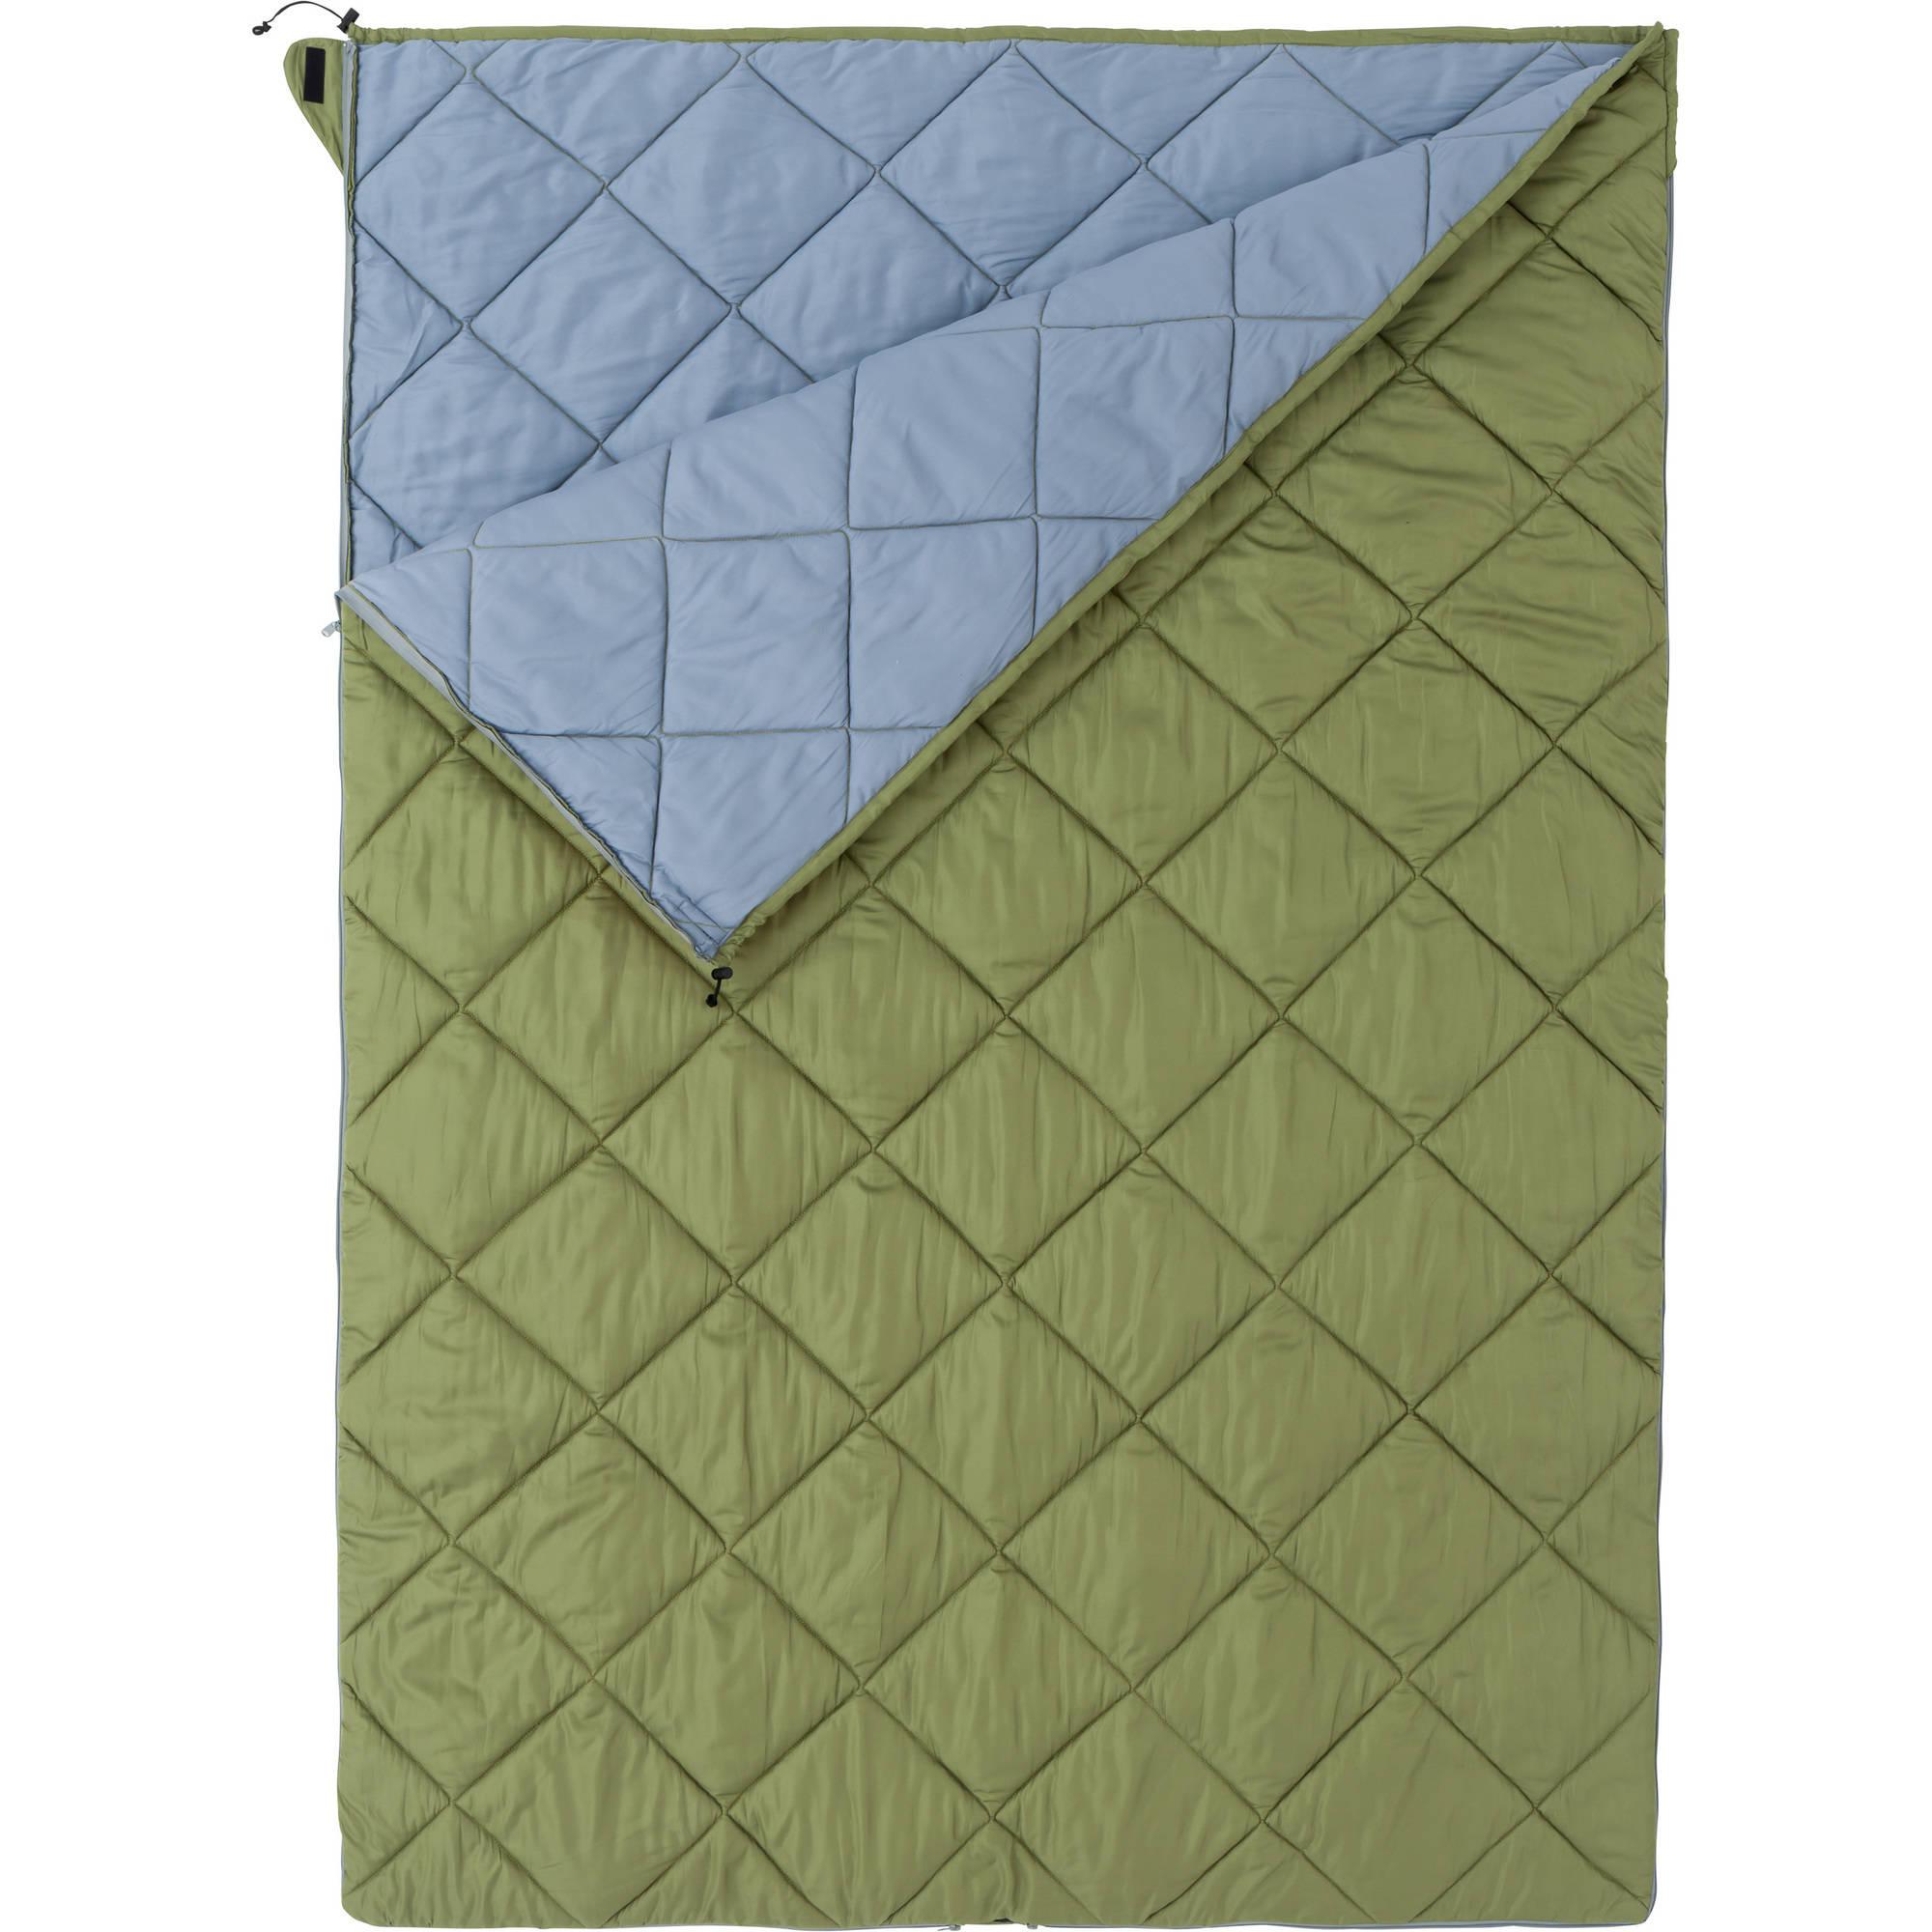 Review Ozark Trail ENV Camper Double Bag 40F Sleeping Bag, Green Review